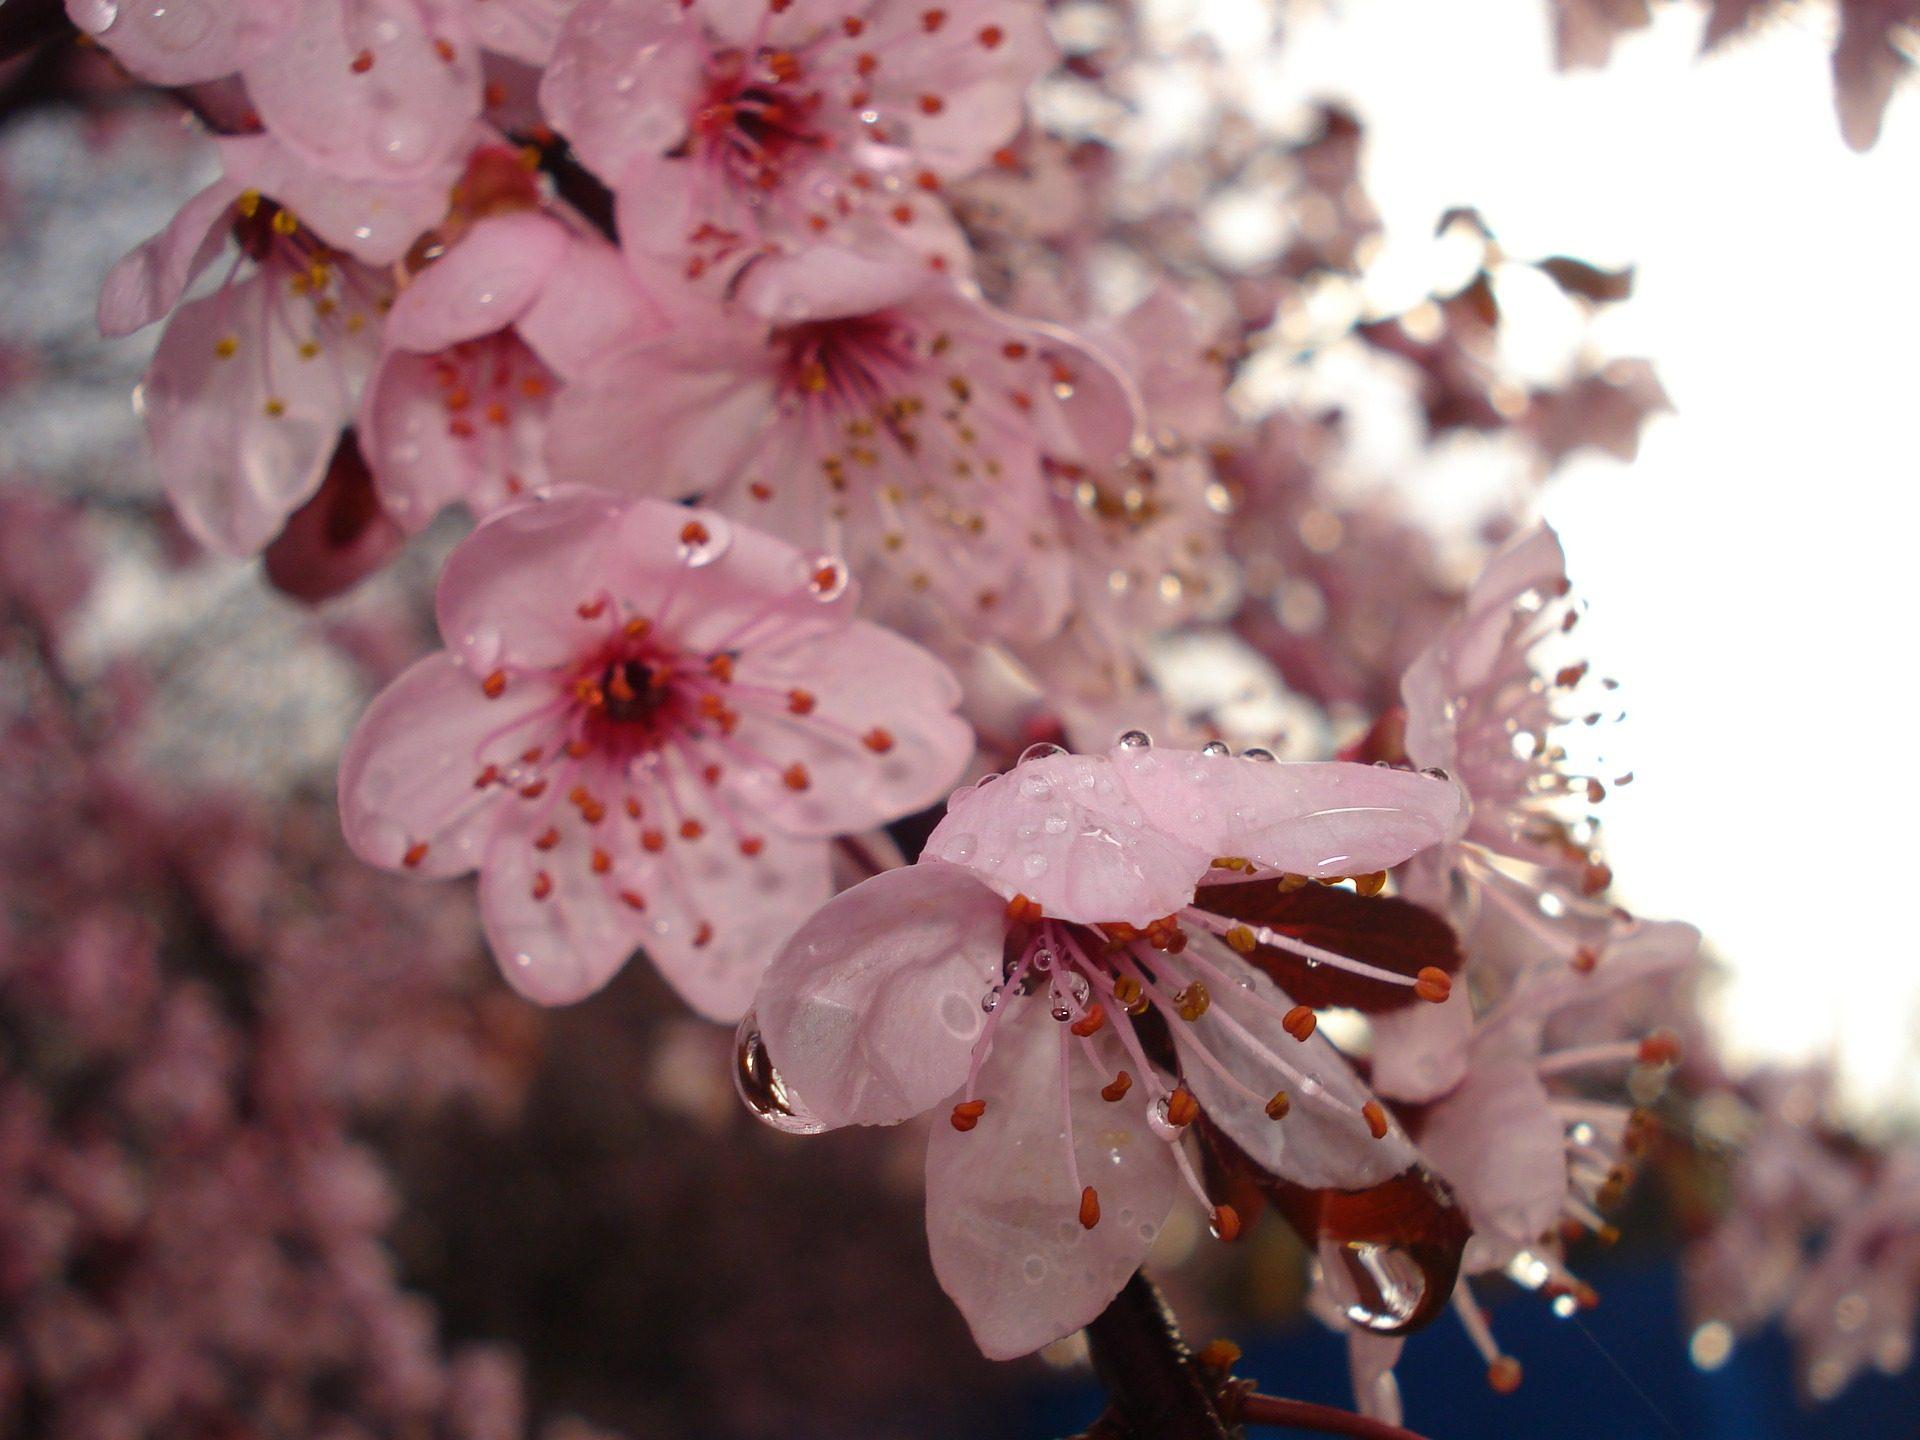 flores, pétalos, gotas, agua, rocío, pistilos, estambres, de cerca - Fondos de Pantalla HD - professor-falken.com